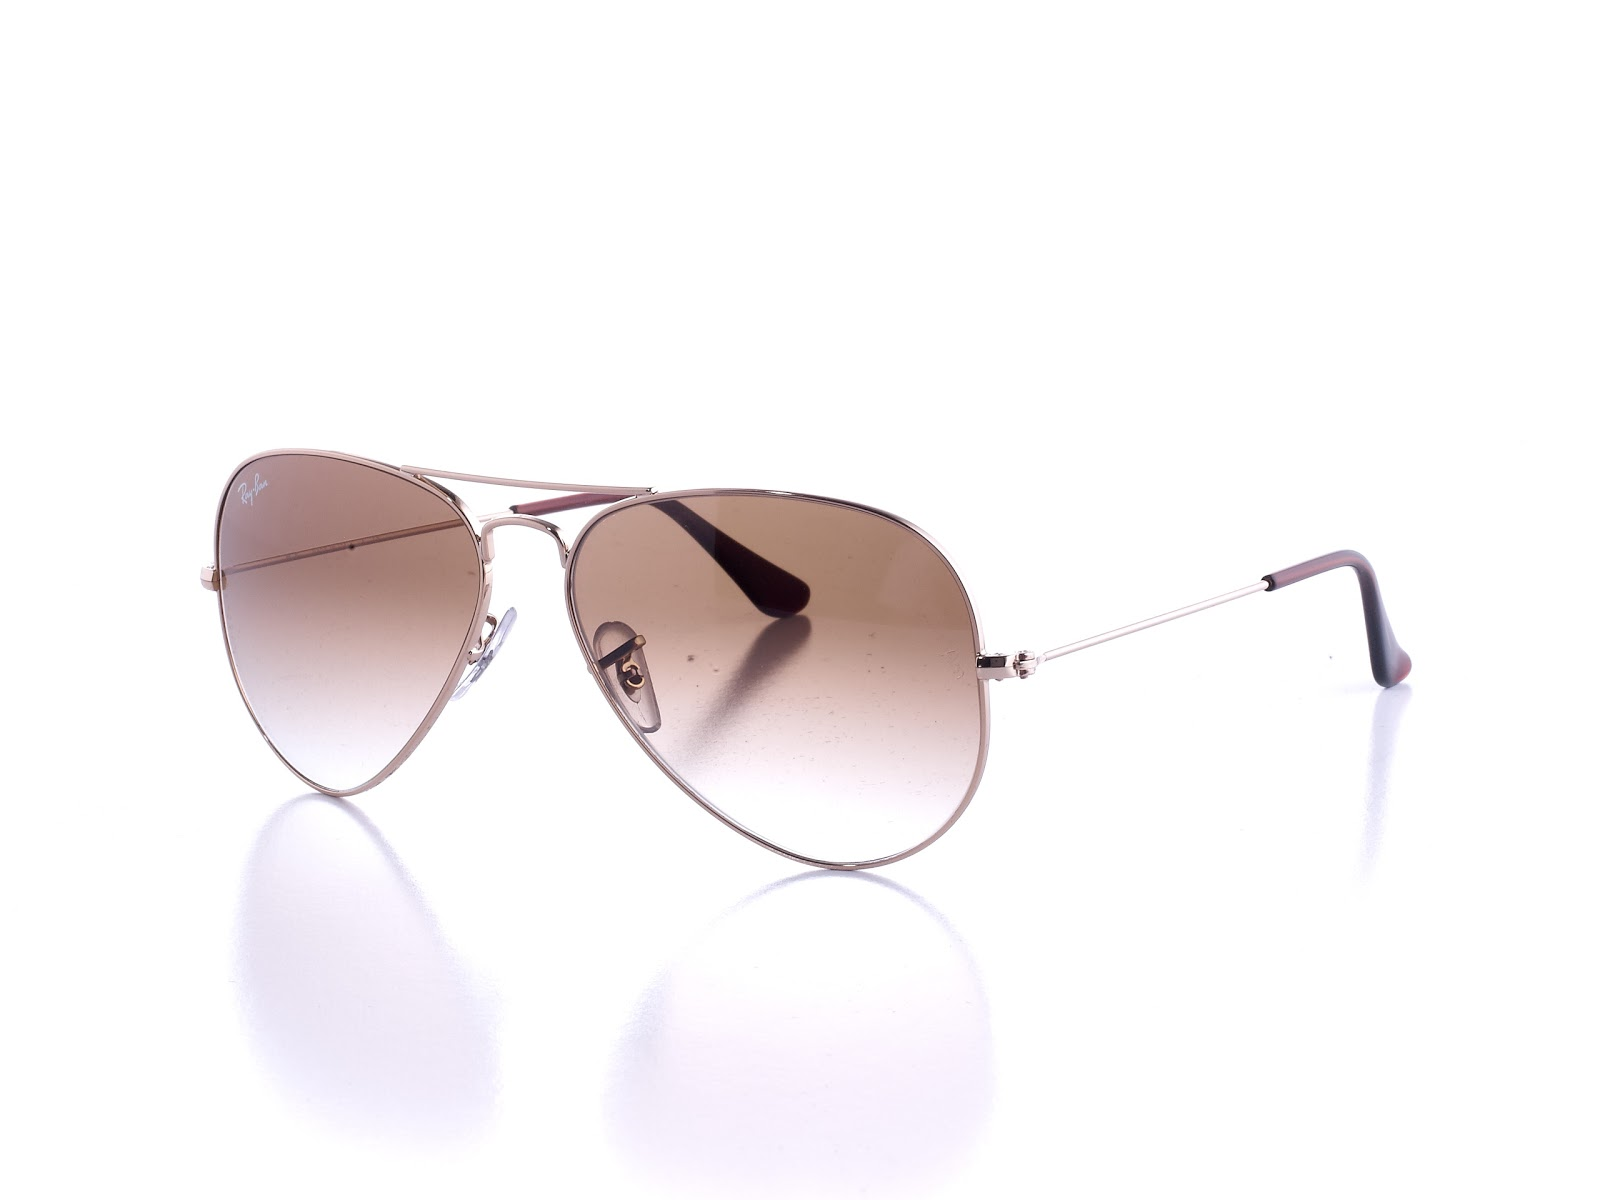 ray ban 3025 aviator sunglasses 61mw  Ray Ban 3025 Aviator